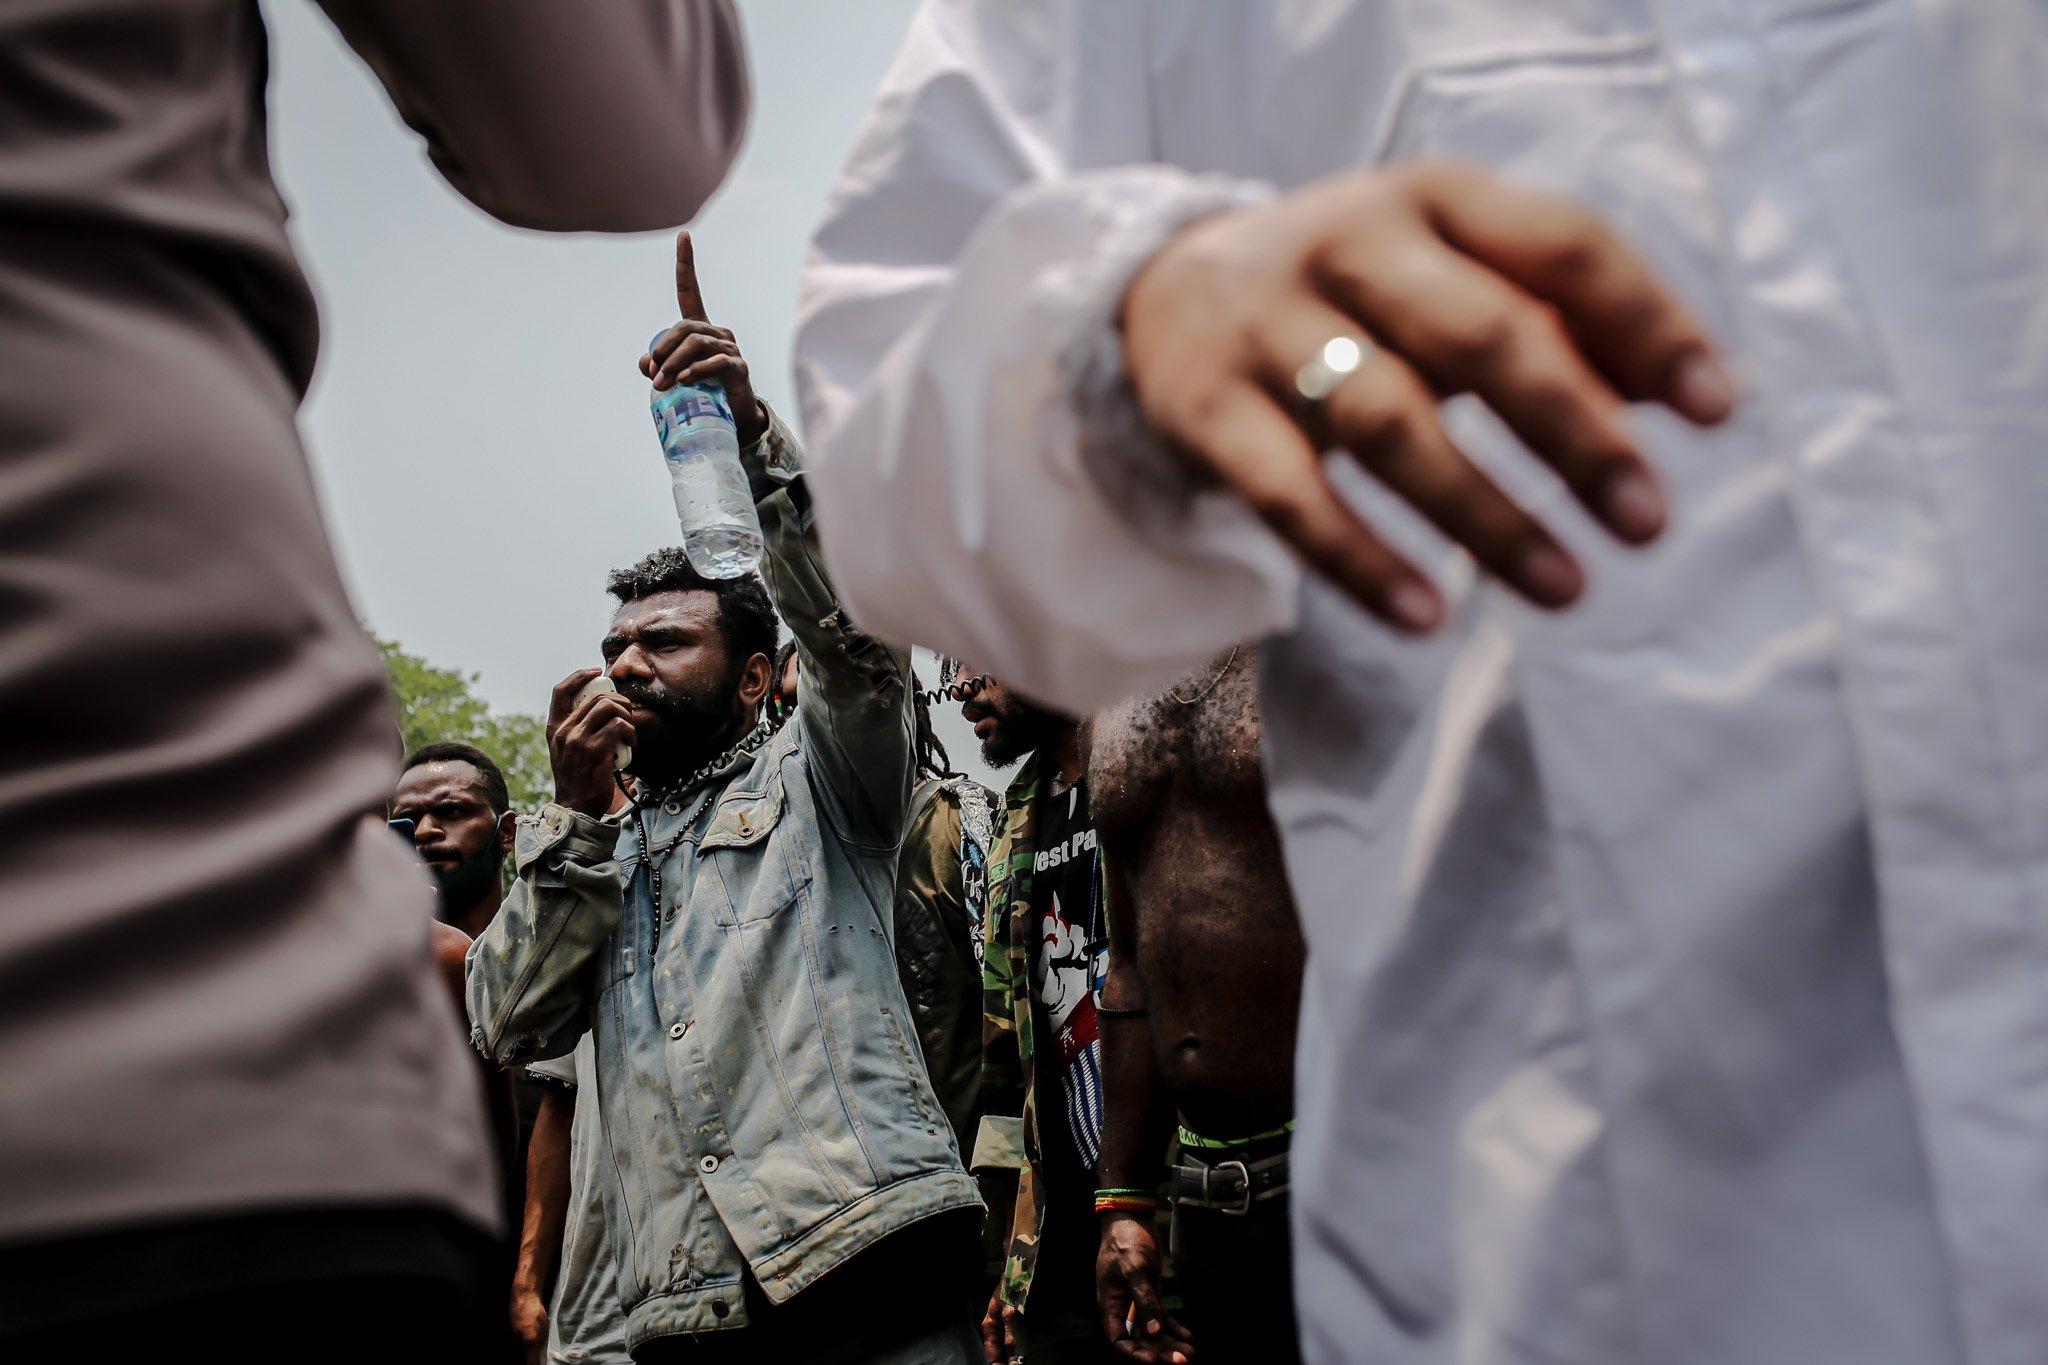 Sejumlah pengunjuk rasa yang tergabung dalam Aliansi Mahasiswa Papua (AMP) menyampaikan pendapat saat aksi unjuk rasa peringatan Roma Agreement ke-59 di Depan Kedutaan Amerika Serikat, Jakarta, Kamis, (30/9/2021). Dalam penyampaian pendapat tersebut salah satu pengunjuk rasa, menanyakan negara terkait kesejahteraan masyarakat Papua saat ini.